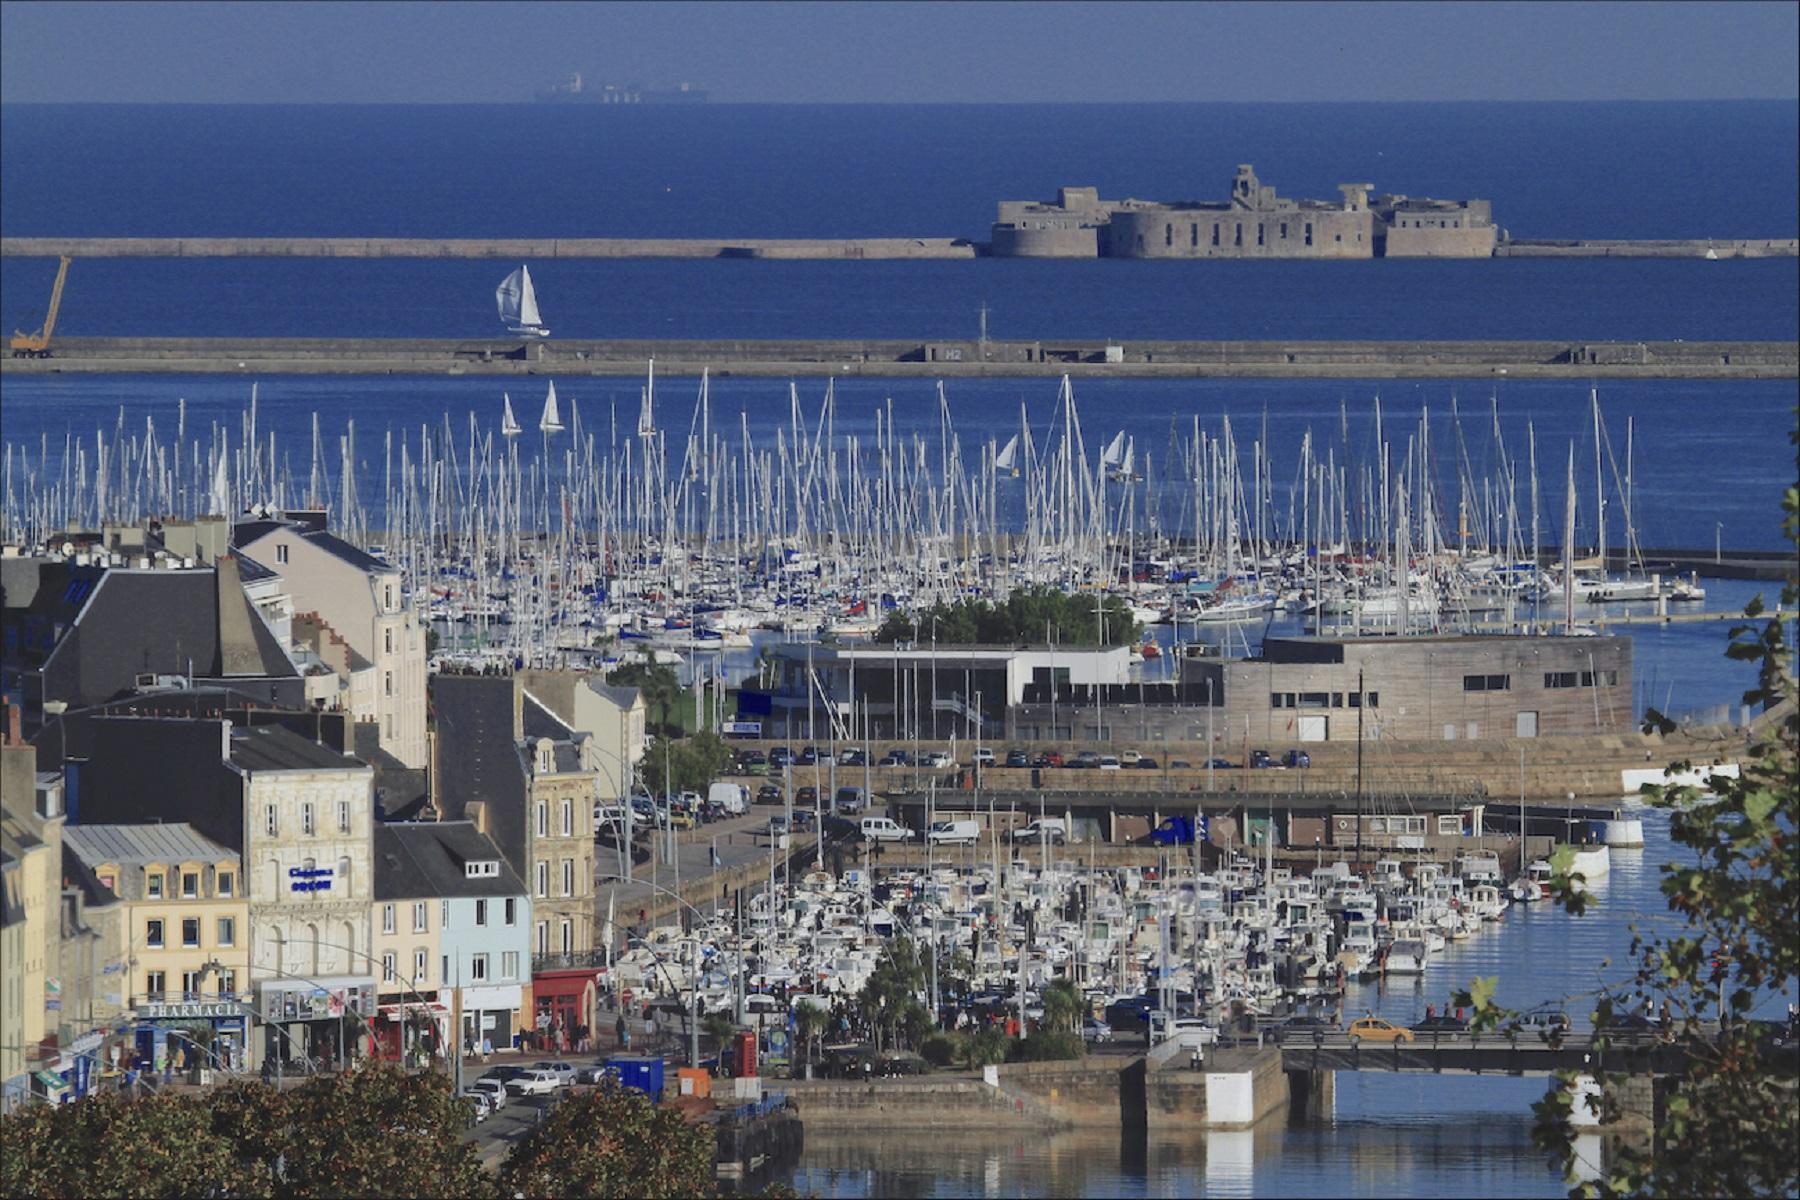 Cherbourg's Port Chantereyne will host the Rolex Fastnet Race fleet © JM enault ville de Cherbourg en Cotentin